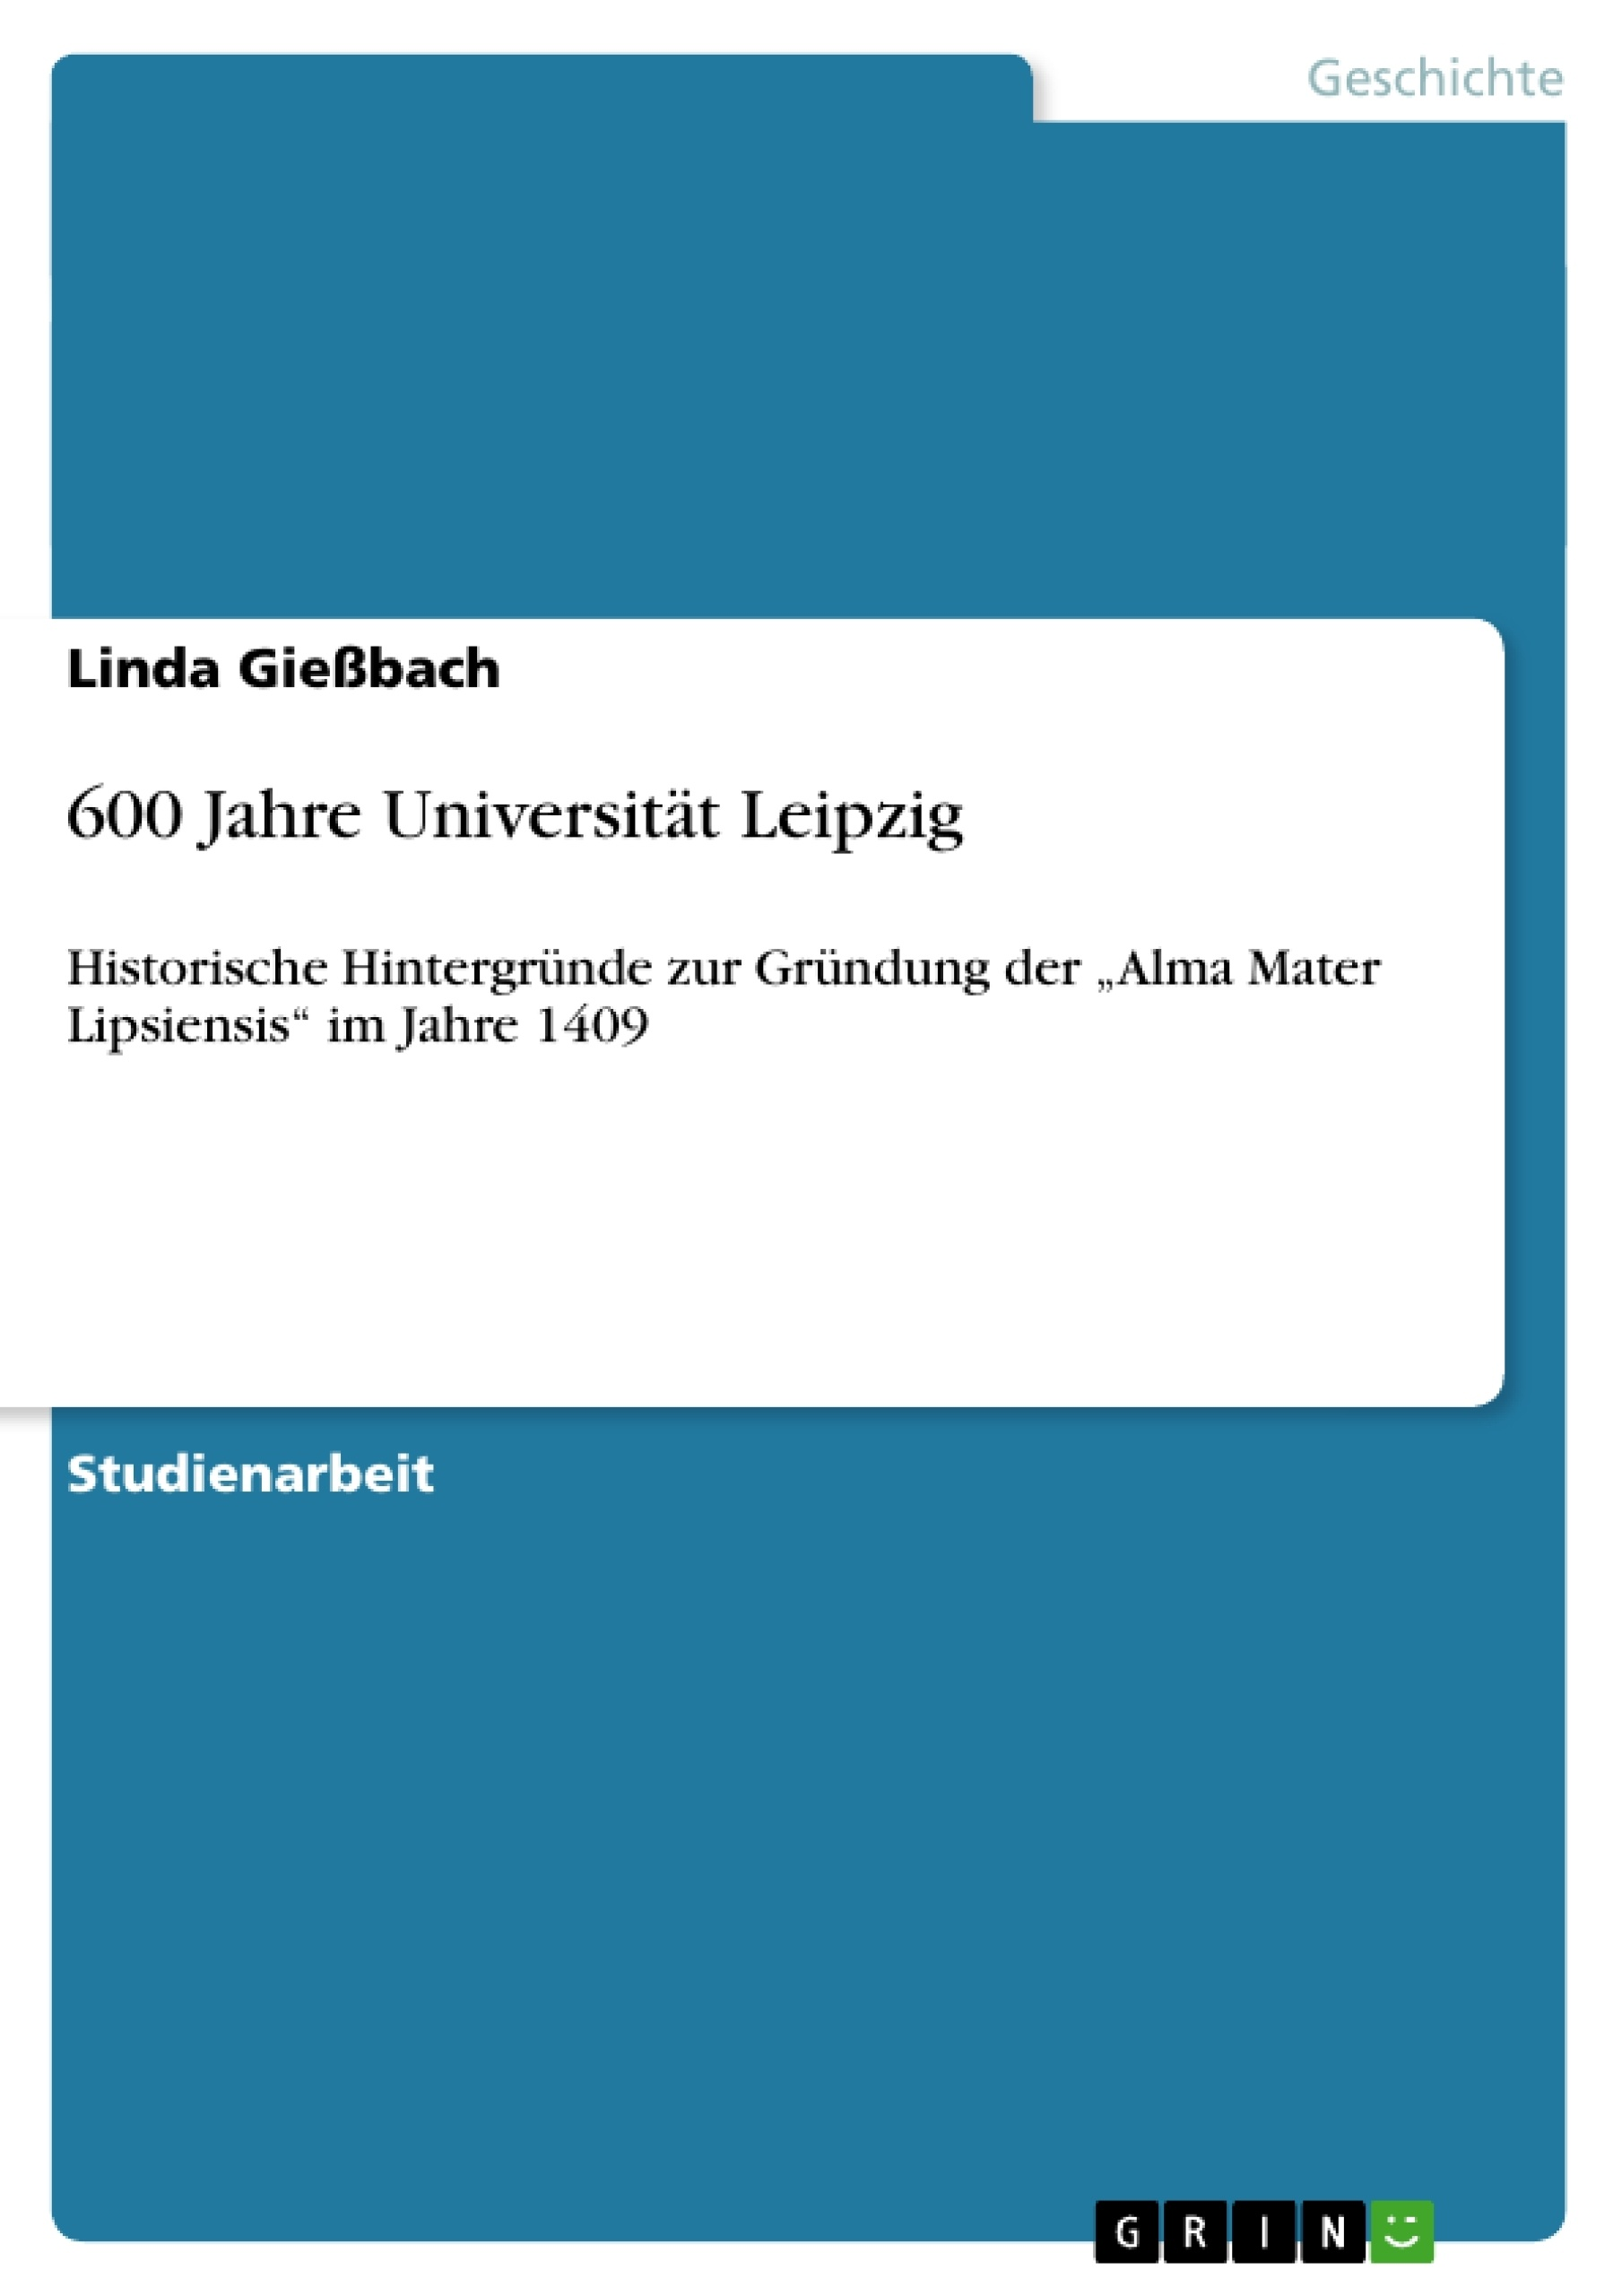 Titel: 600 Jahre Universität Leipzig